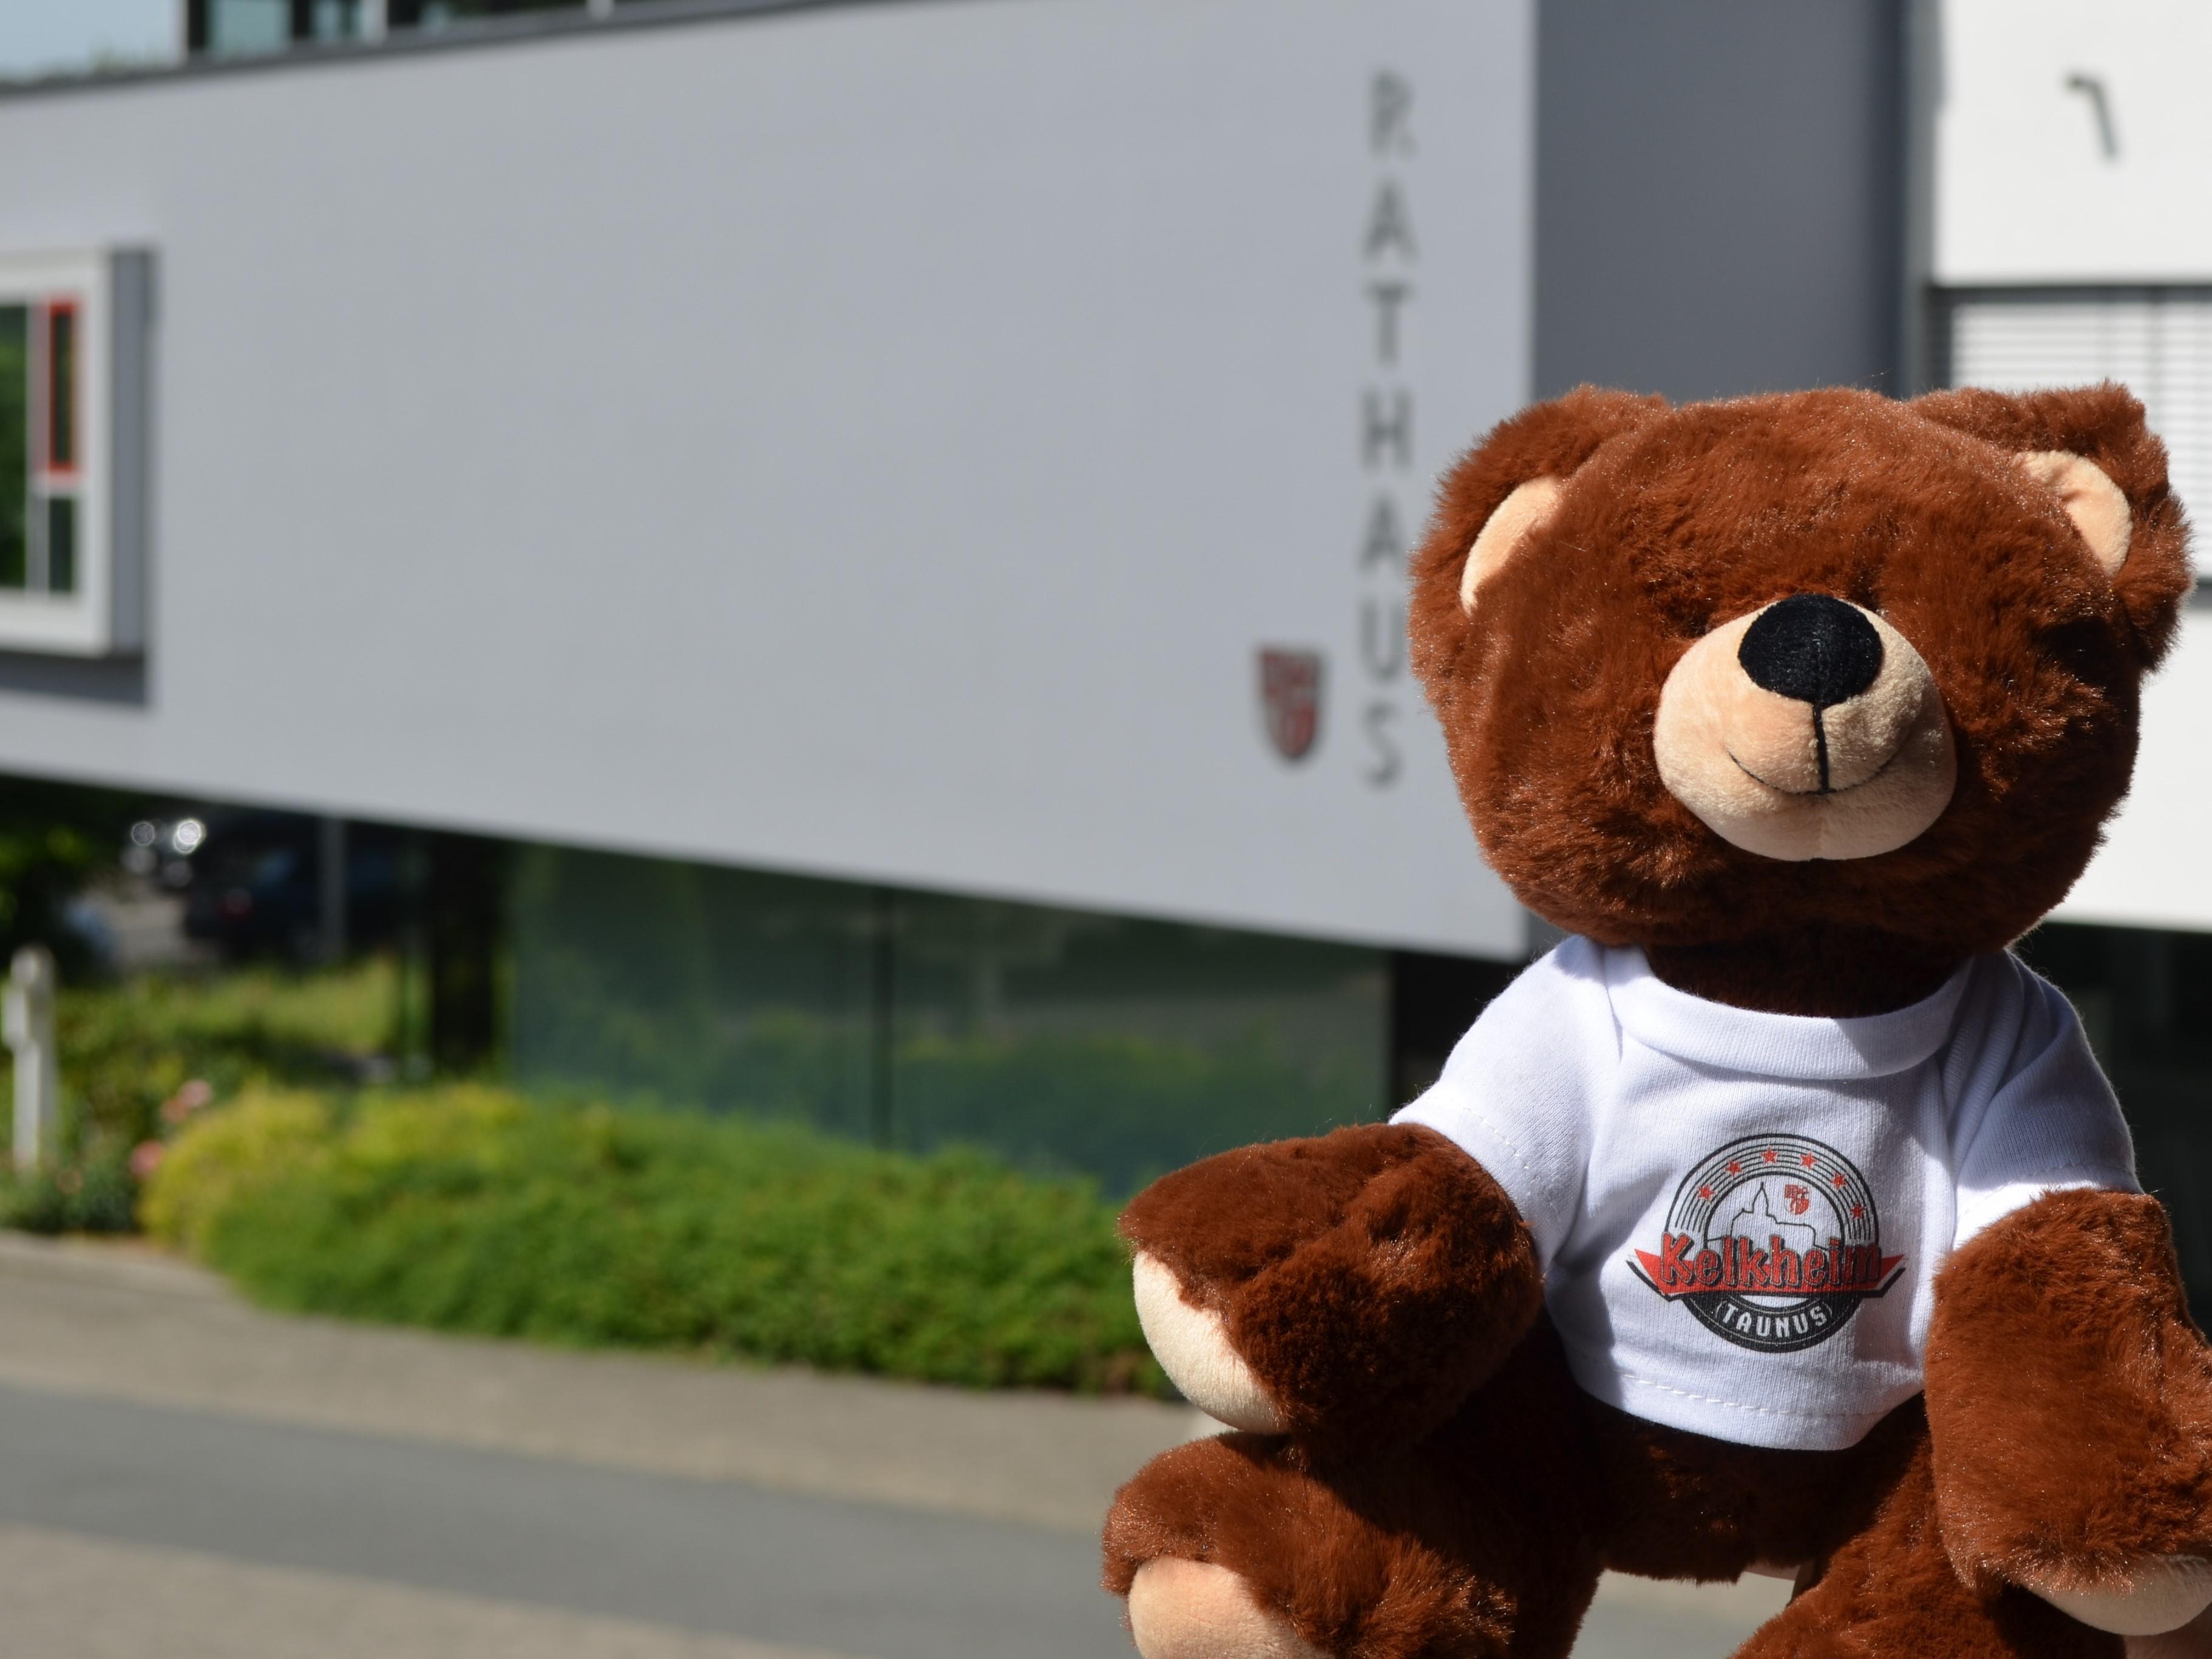 Teddybär Kalle mit Kelkheim T-Shirt vor dem Rathaus